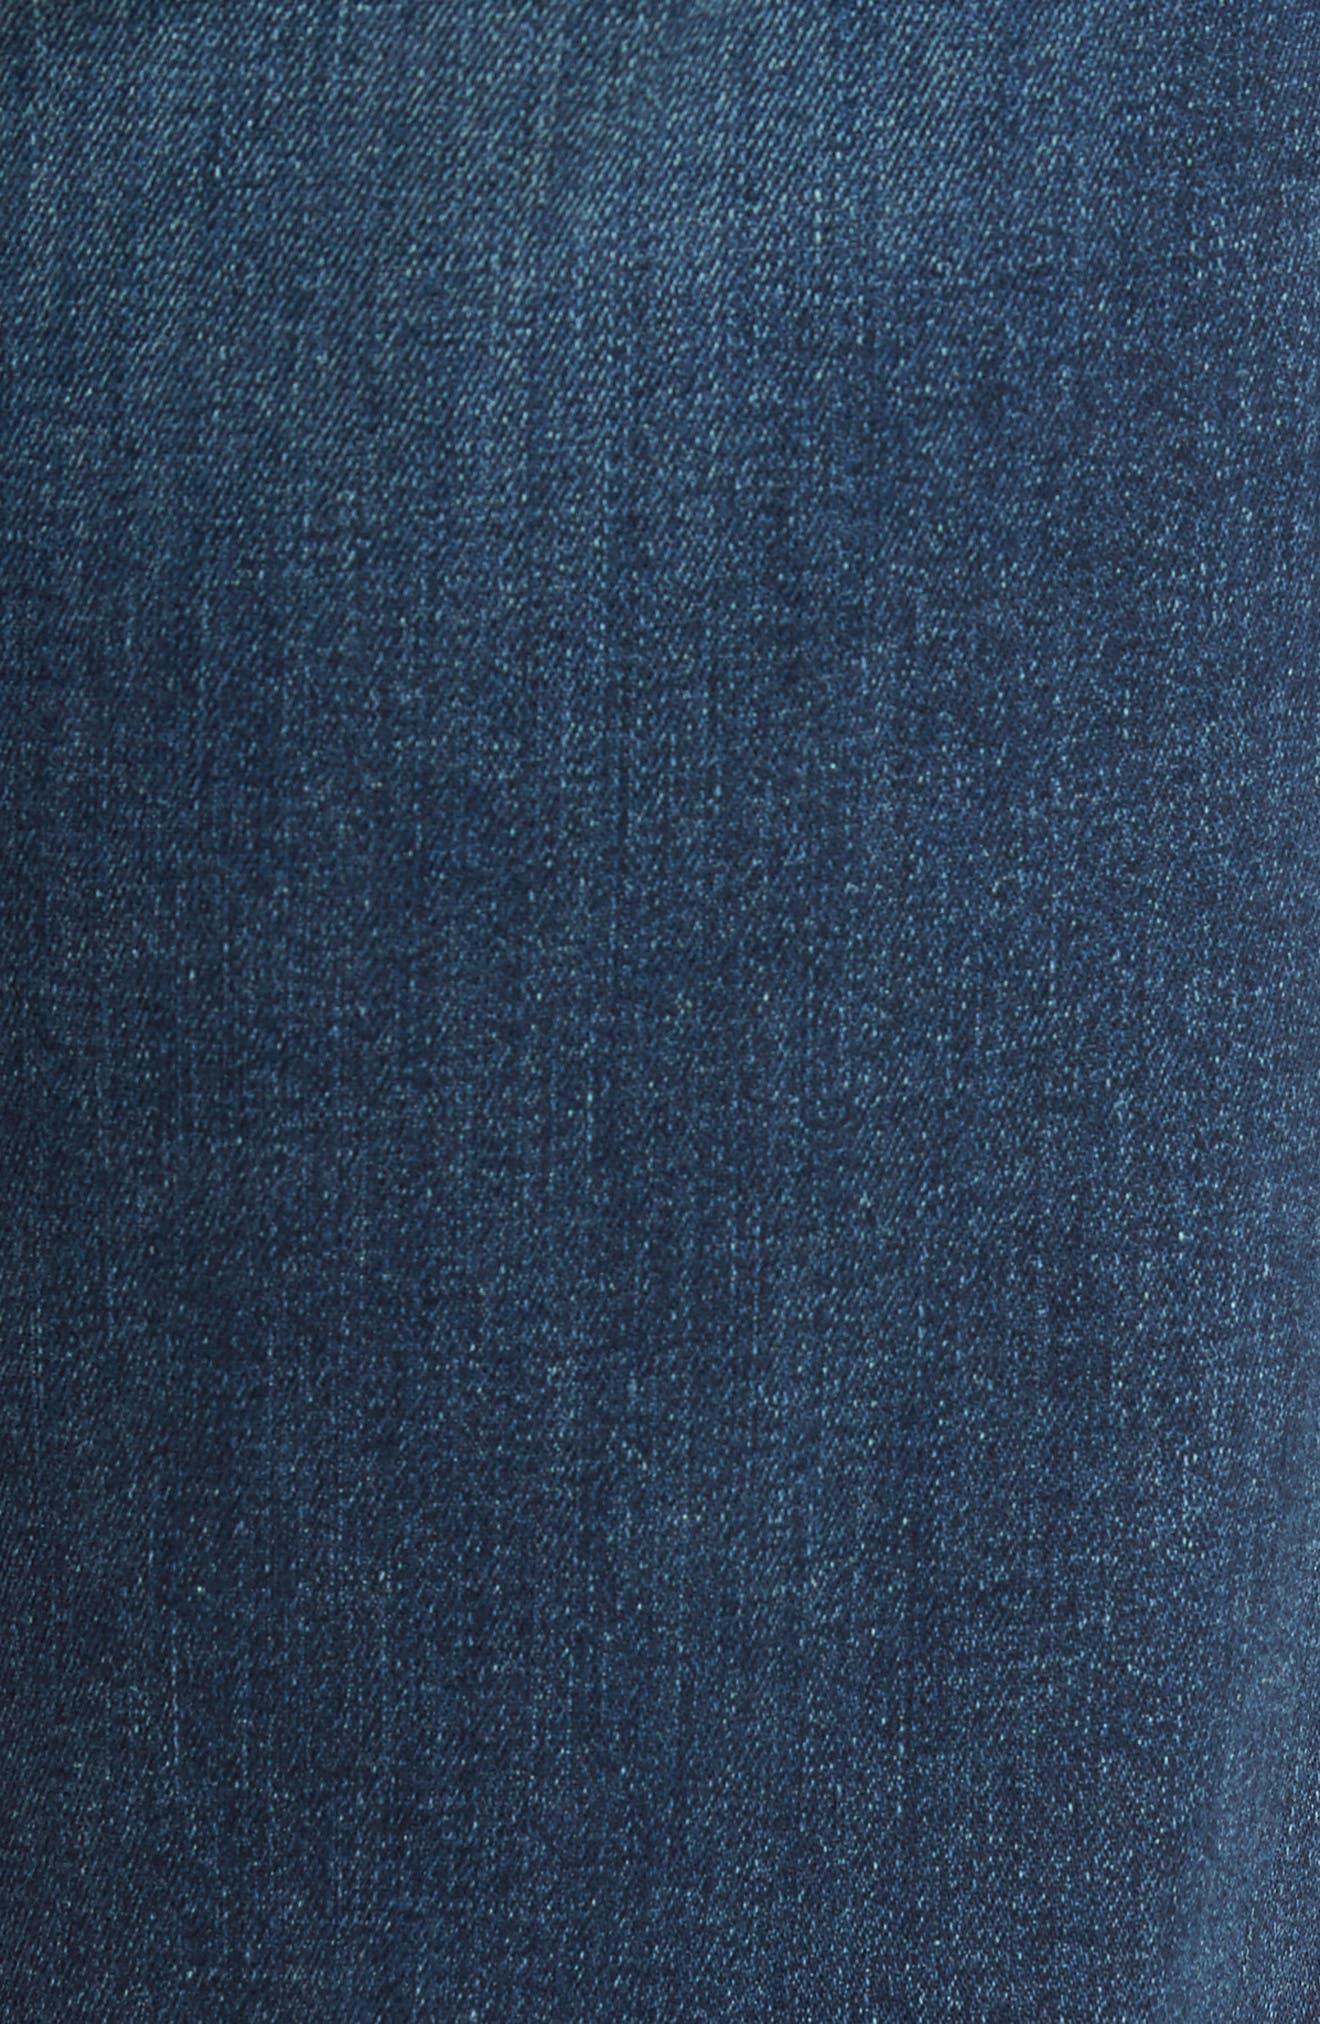 Legacy - Normandie Straight Leg Jeans,                             Alternate thumbnail 5, color,                             Ewan